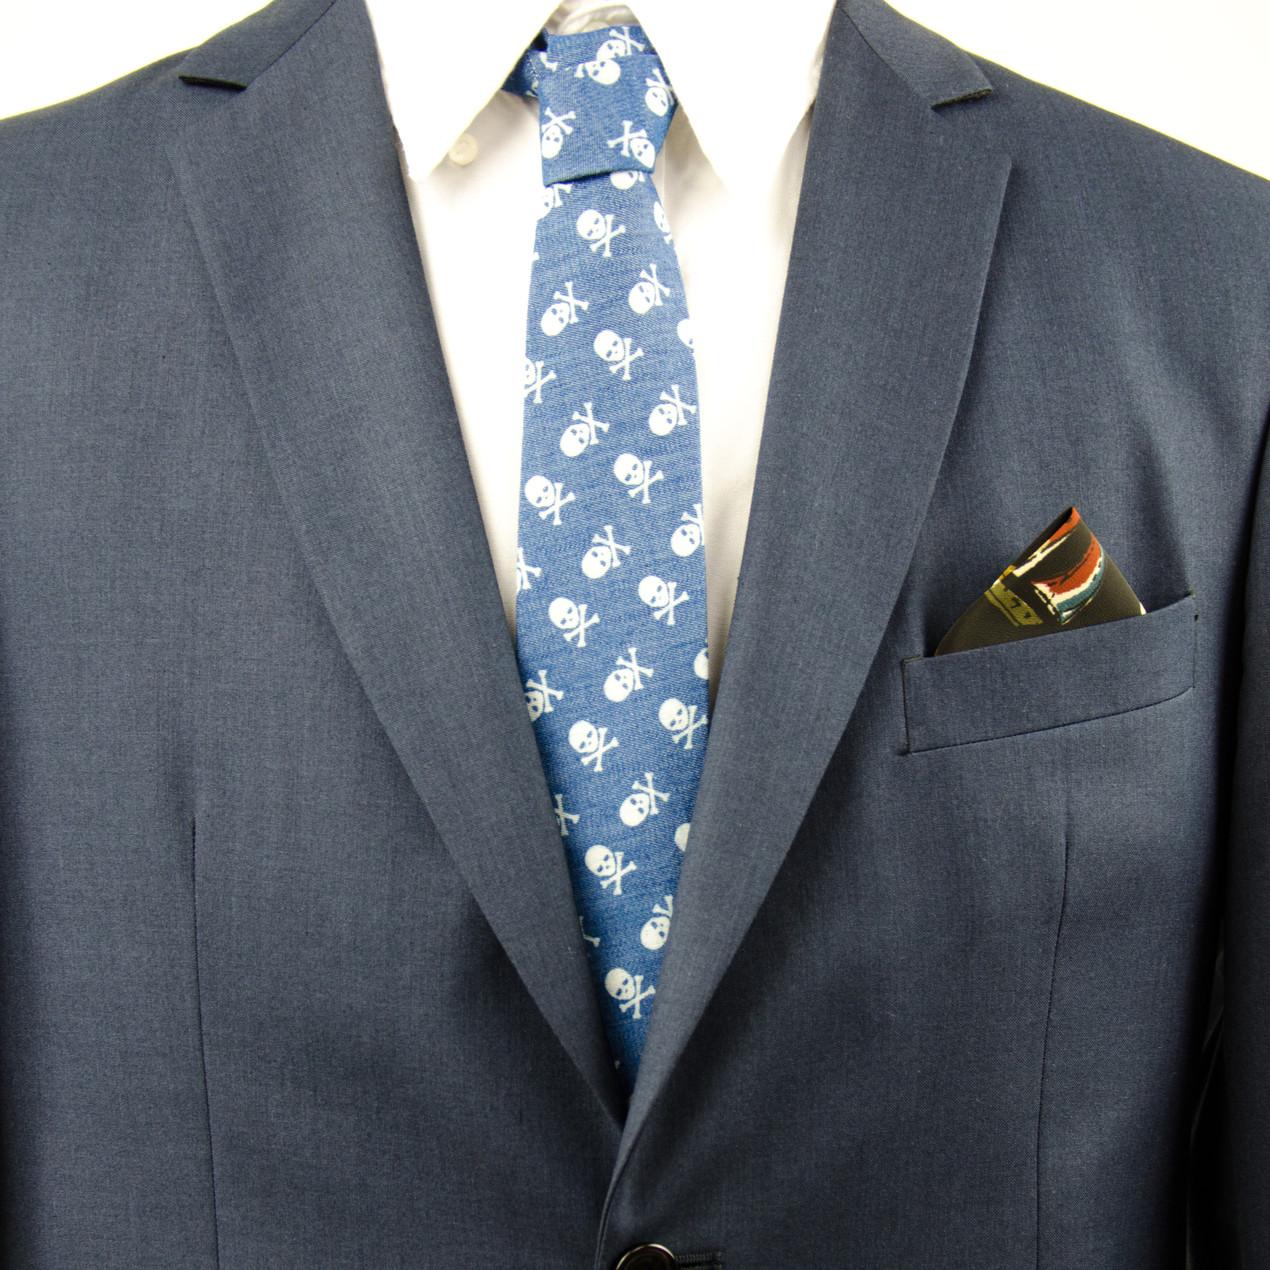 Dead Skull Necktie. Heng Fashion. Men Accessories. Made in Berlin.